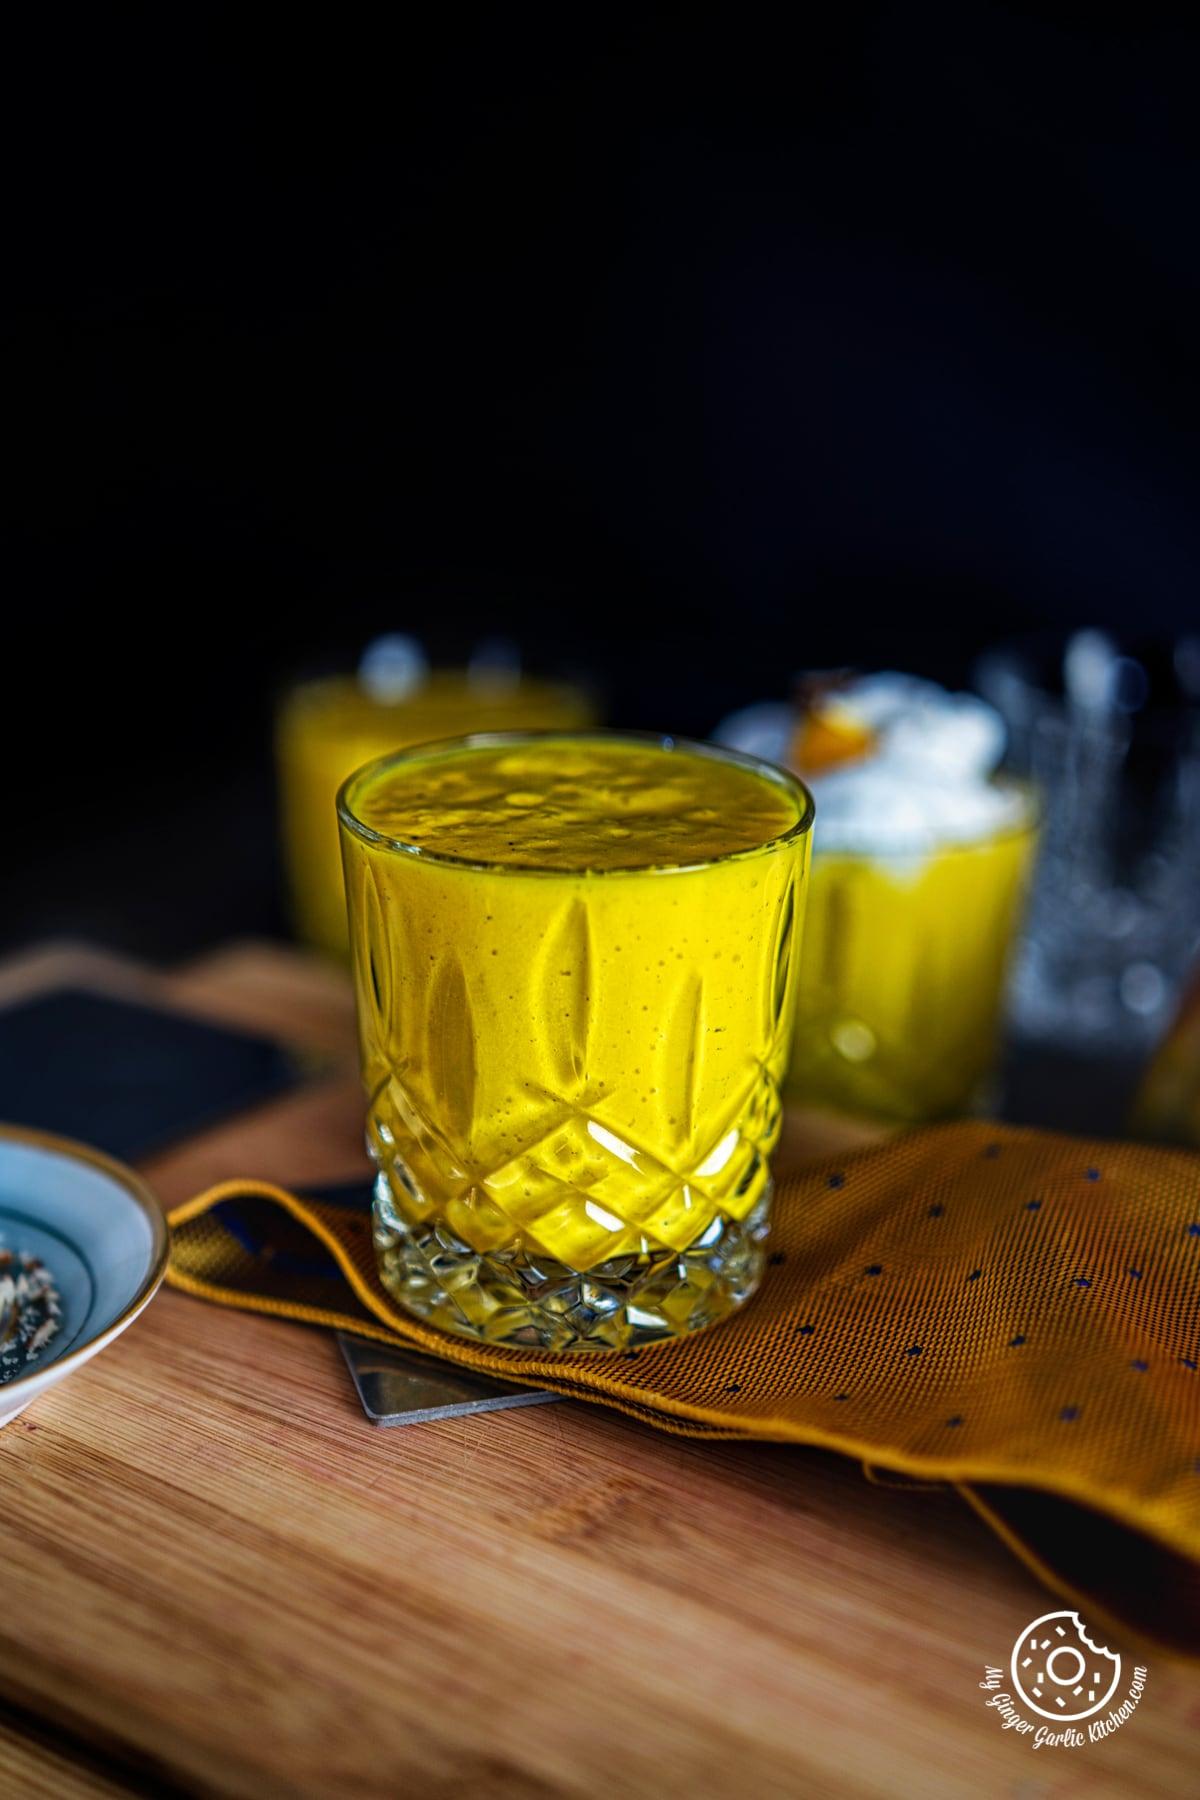 mango milkshake in a glass